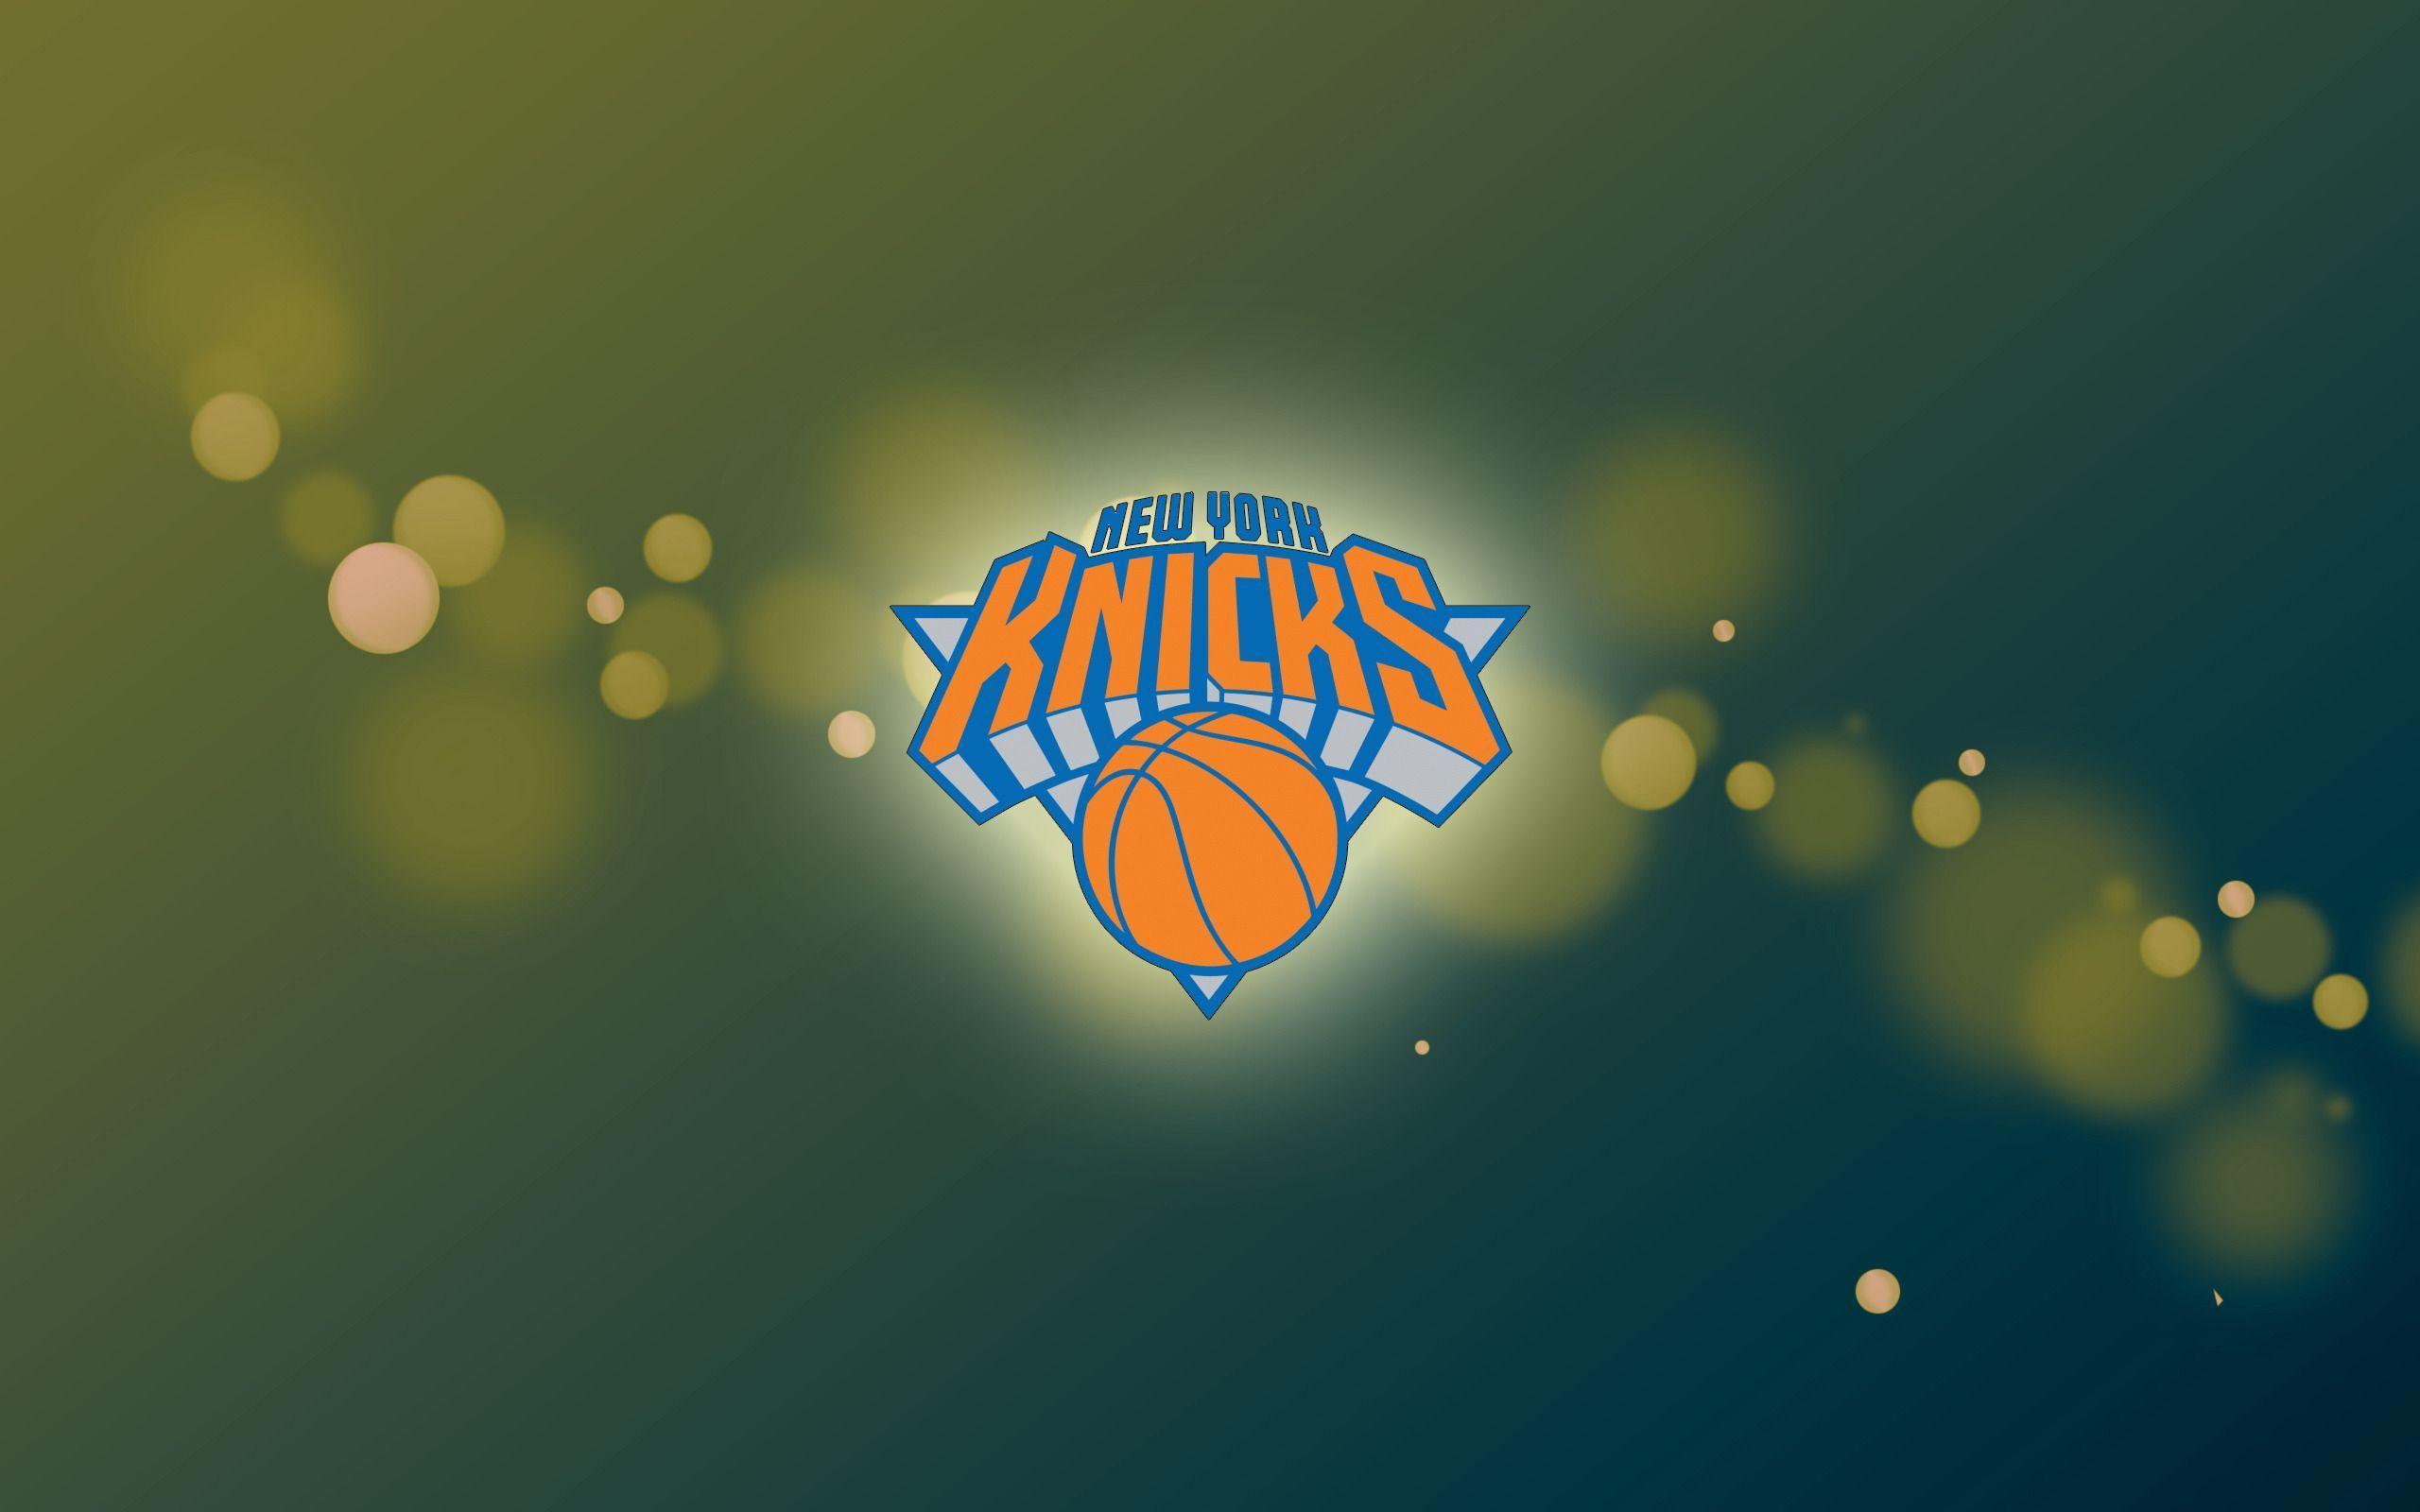 Nba Basketball New York Knicks: NBA Team Logos Wallpapers 2016